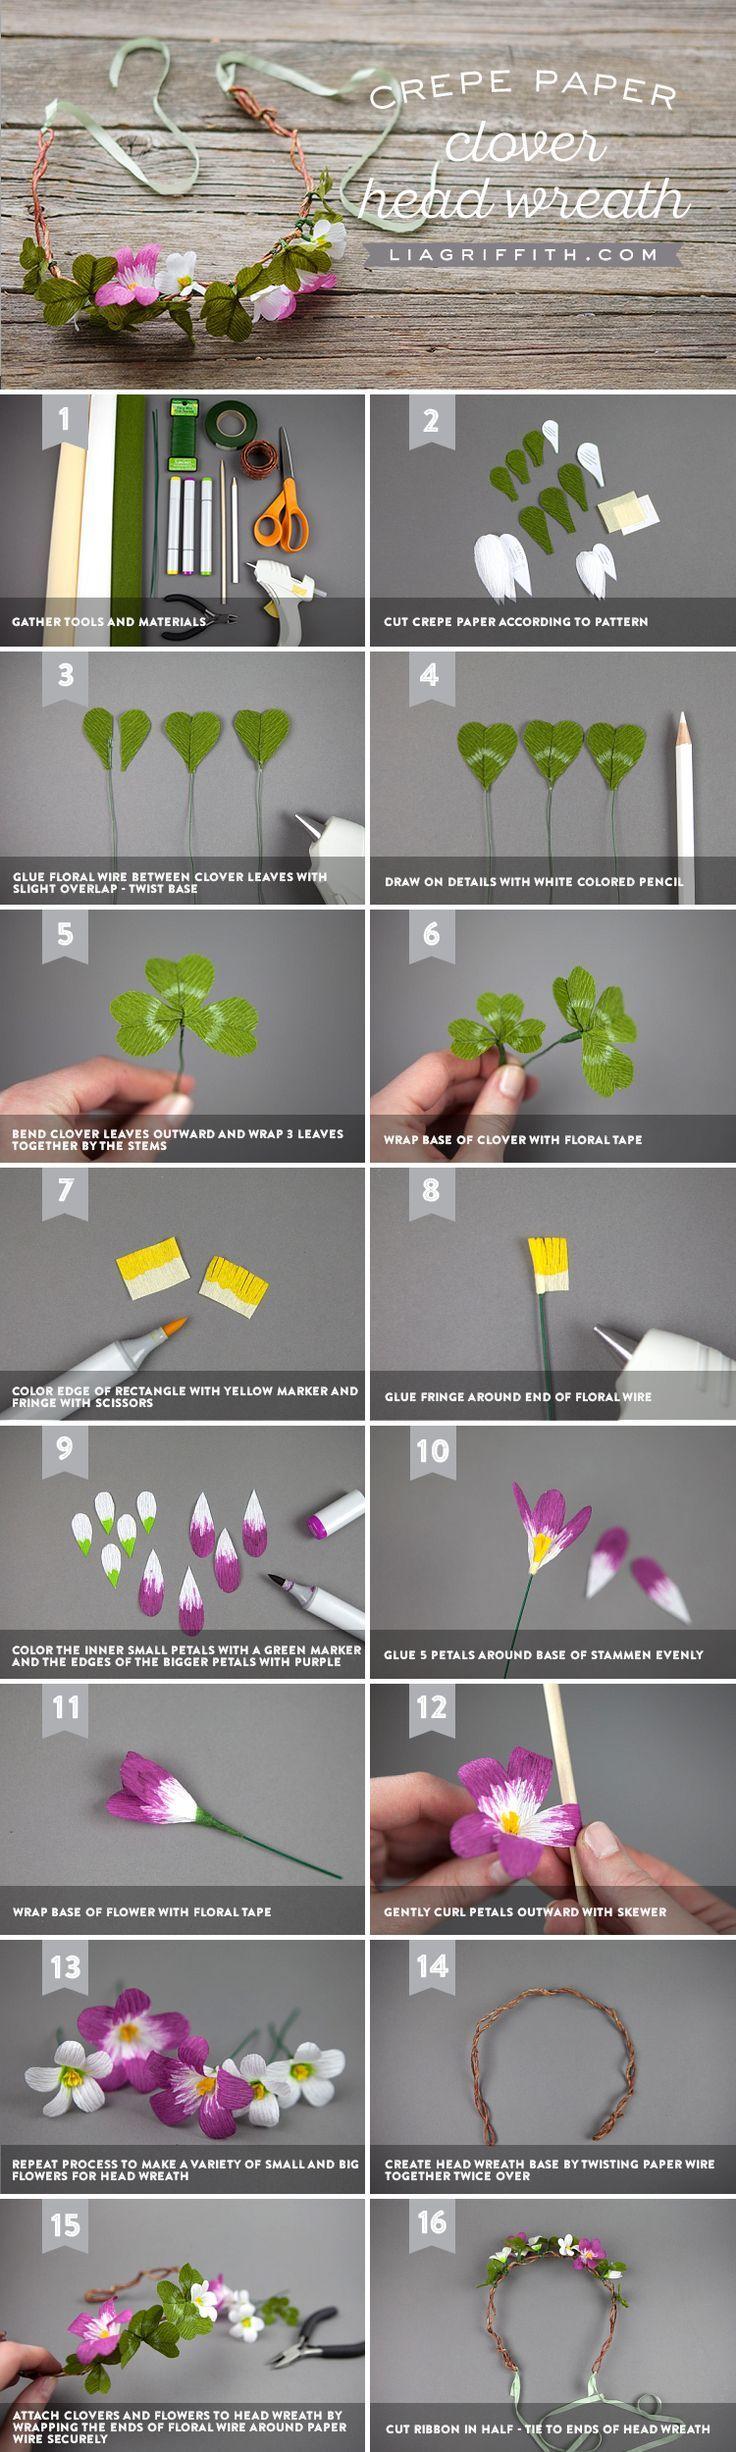 Make a Fairy Head Wreath with Shamrocks and Ribbon | Wreath tutorial ...